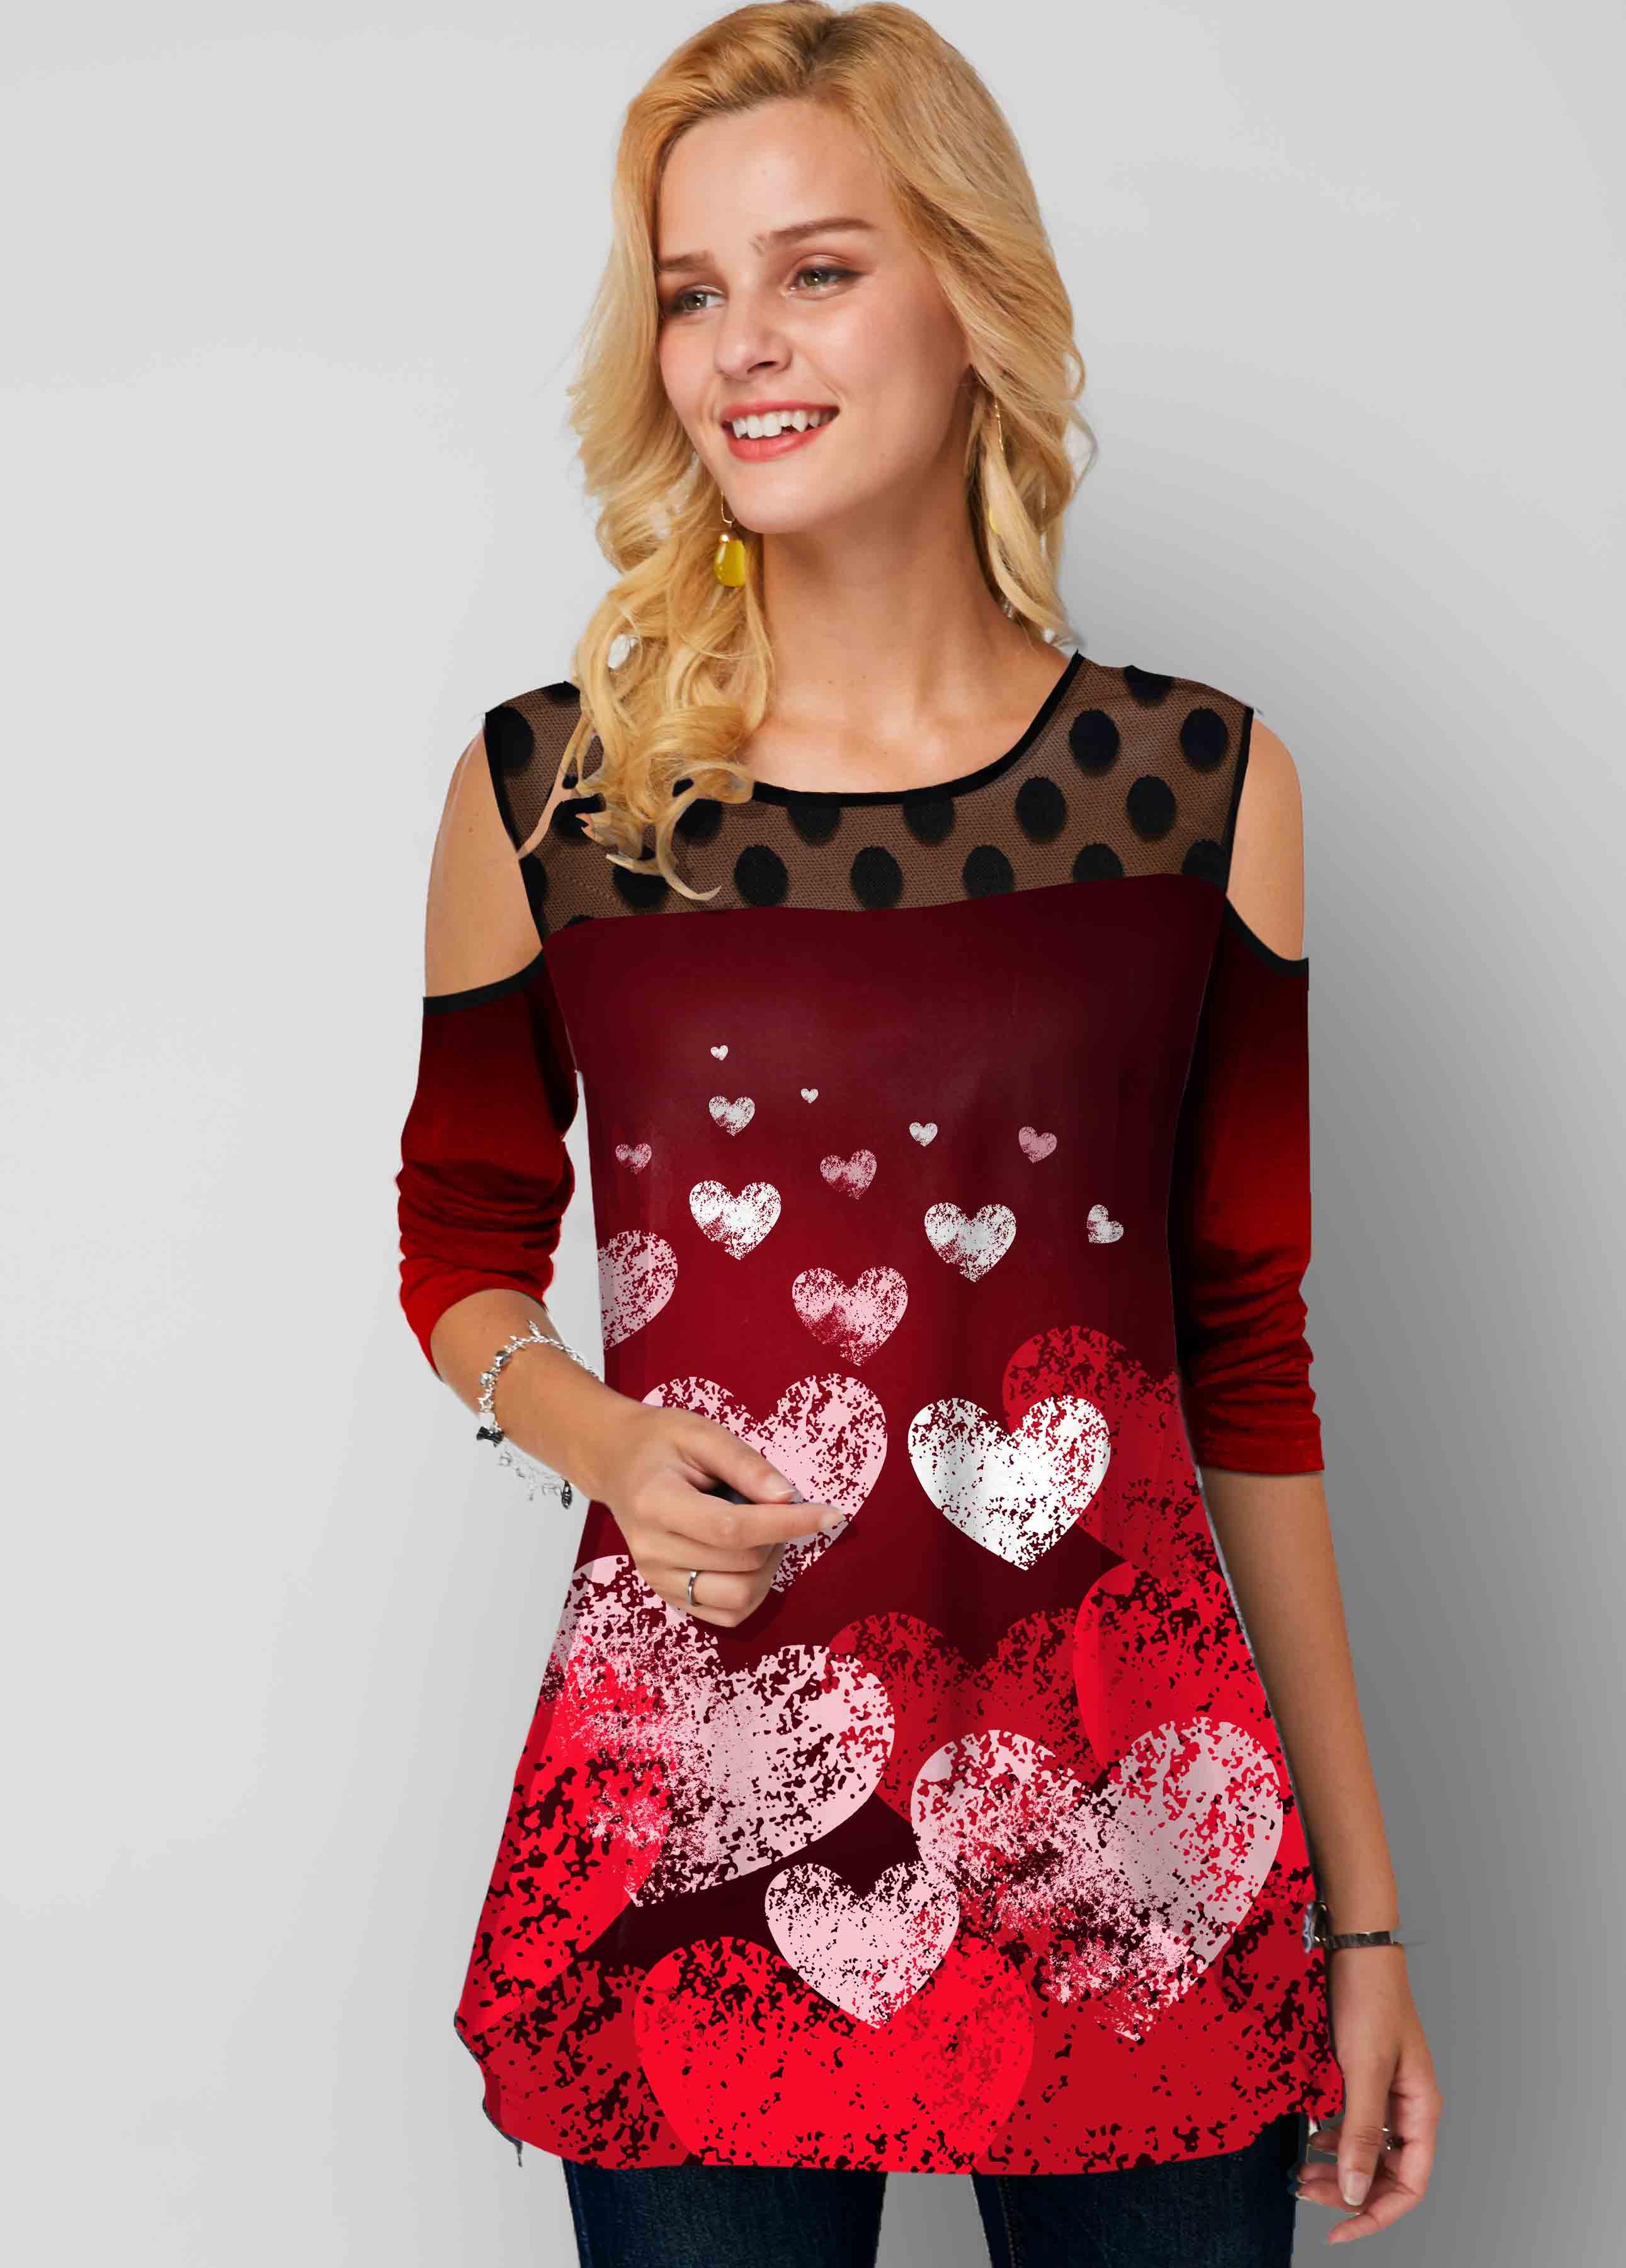 Heart Print Mesh Stitching Polka Dot Cold Shoulder Tunic Top